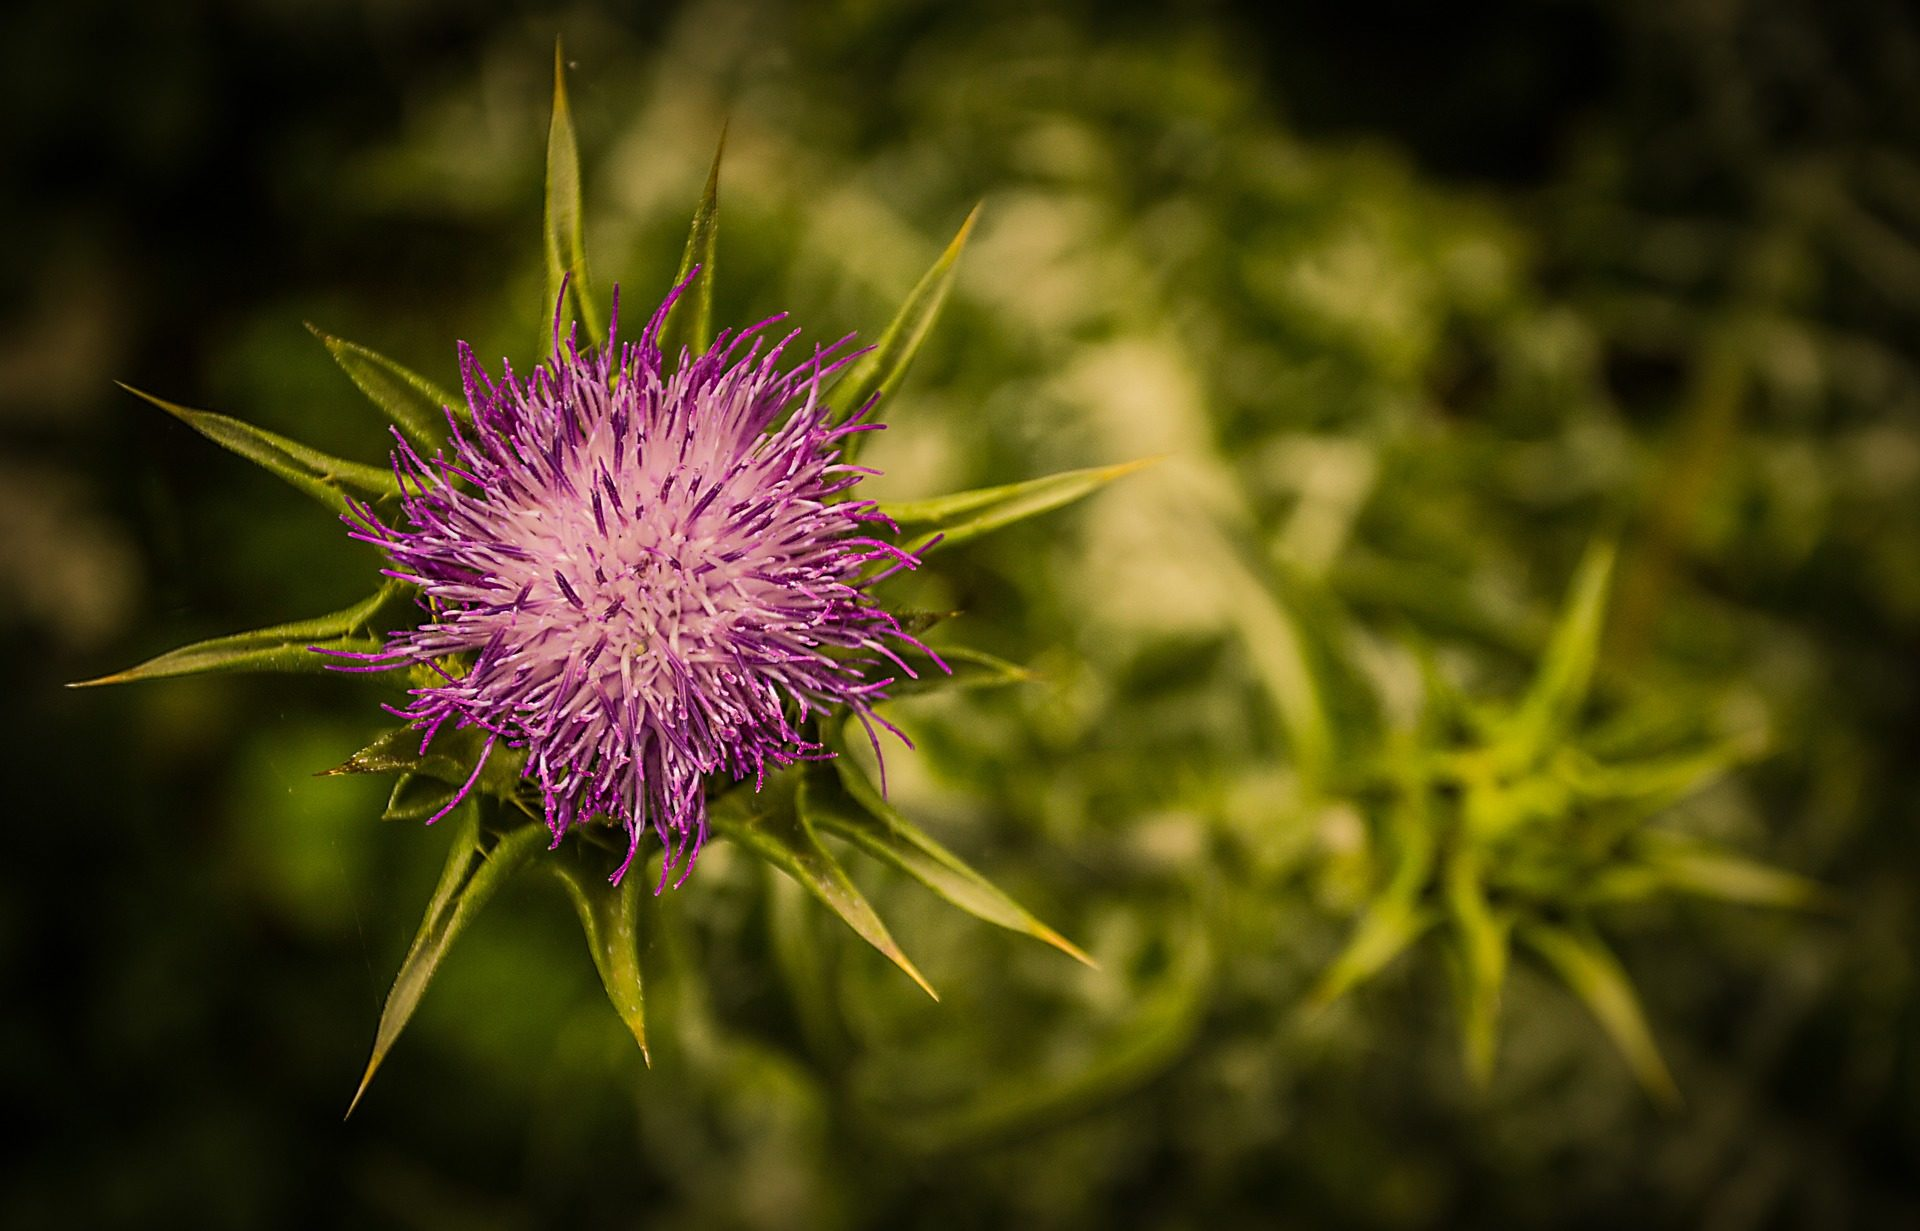 flor, planta, cardo, espinas, hierba, maleza - Fondos de Pantalla HD - professor-falken.com